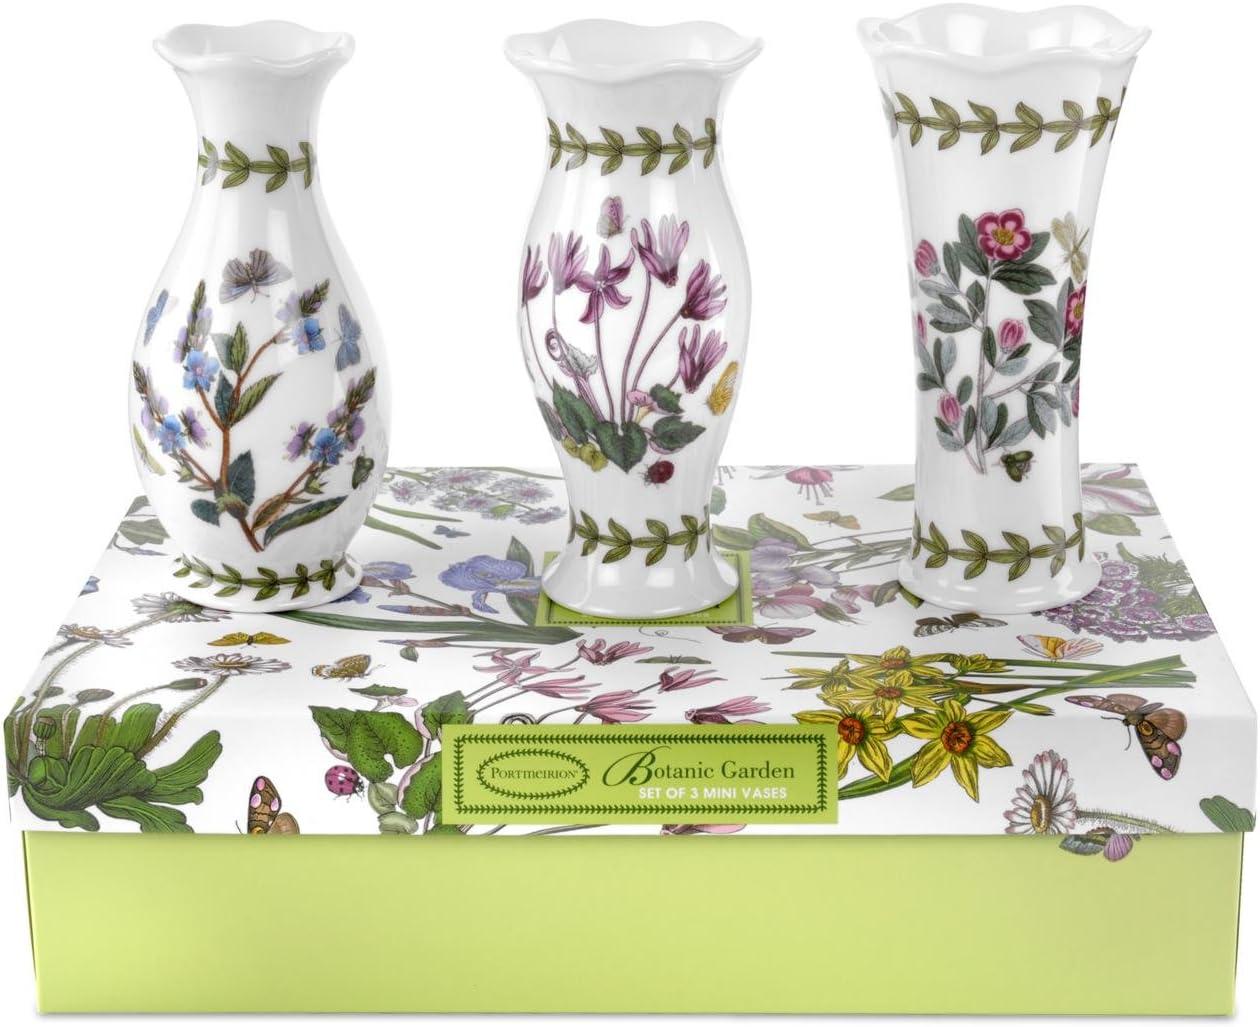 Portmeirion Botanic Garden Vases, Mini, Set of 3